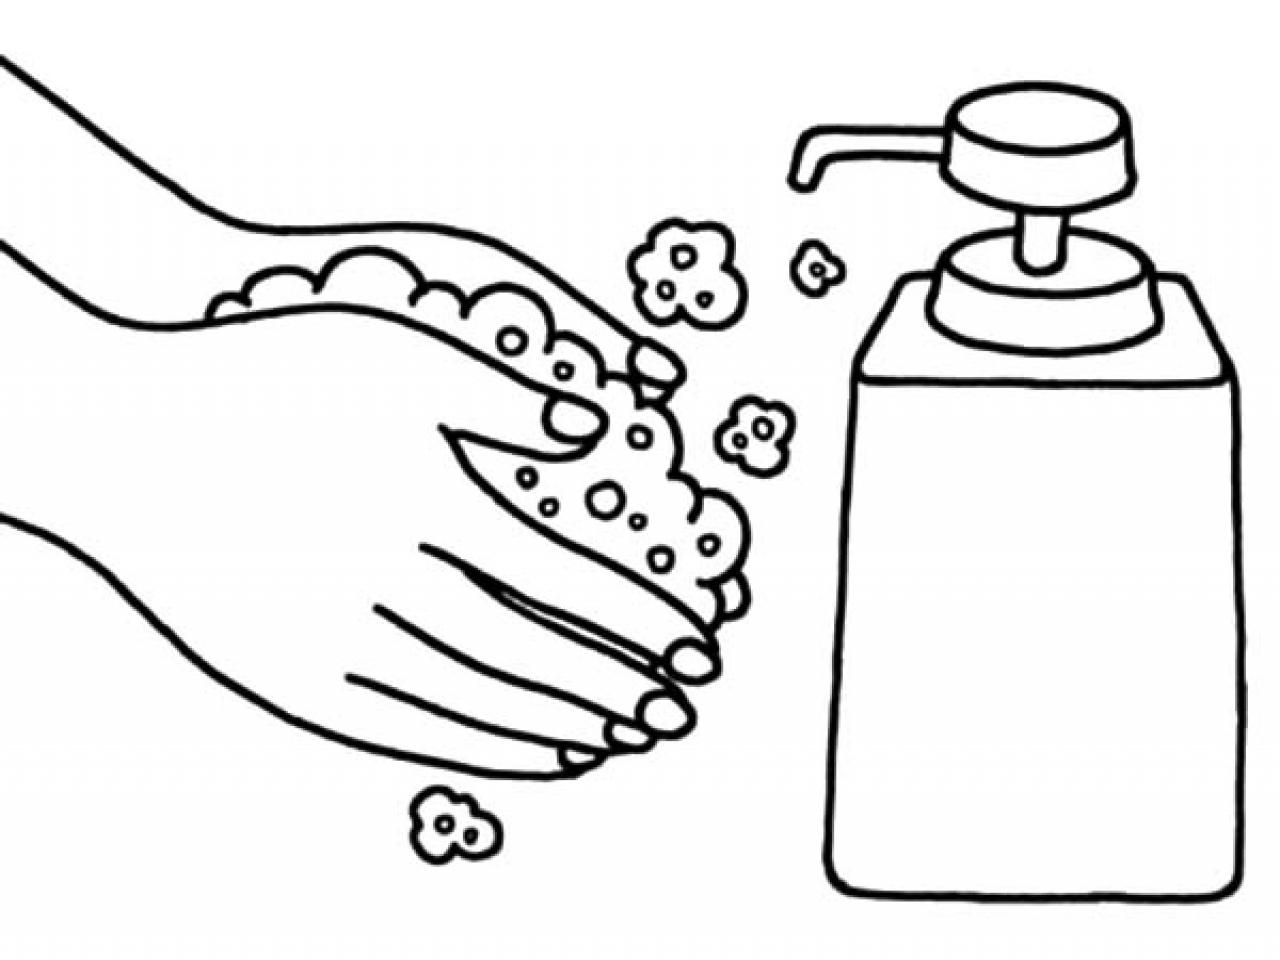 Washing Hands Drawing